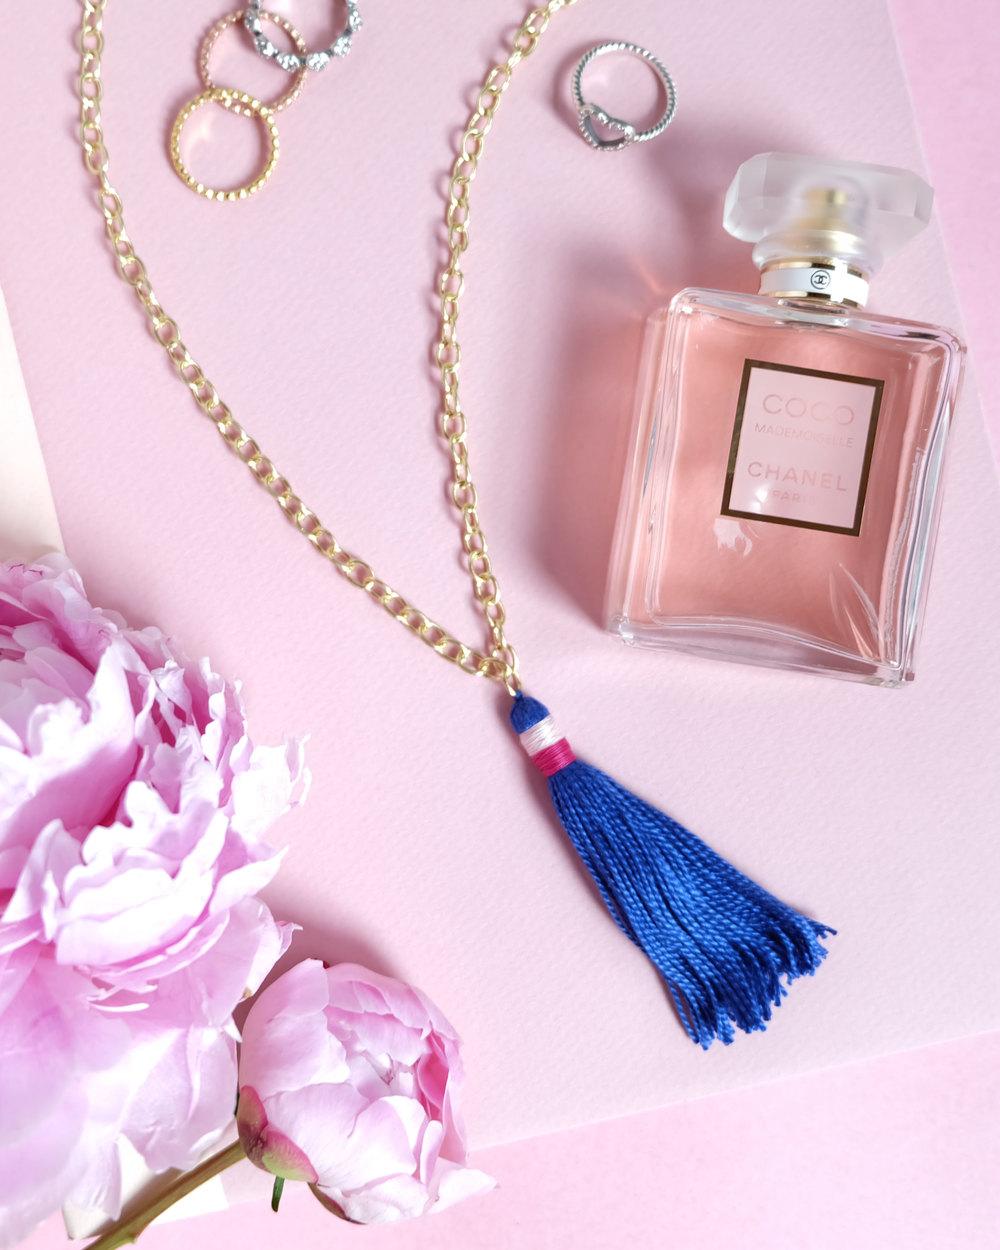 Easy & Inexpensive DIY Tassel Necklace, Summer Jewelry Trends 2016, DIY on www.me-and-mrjones.com!